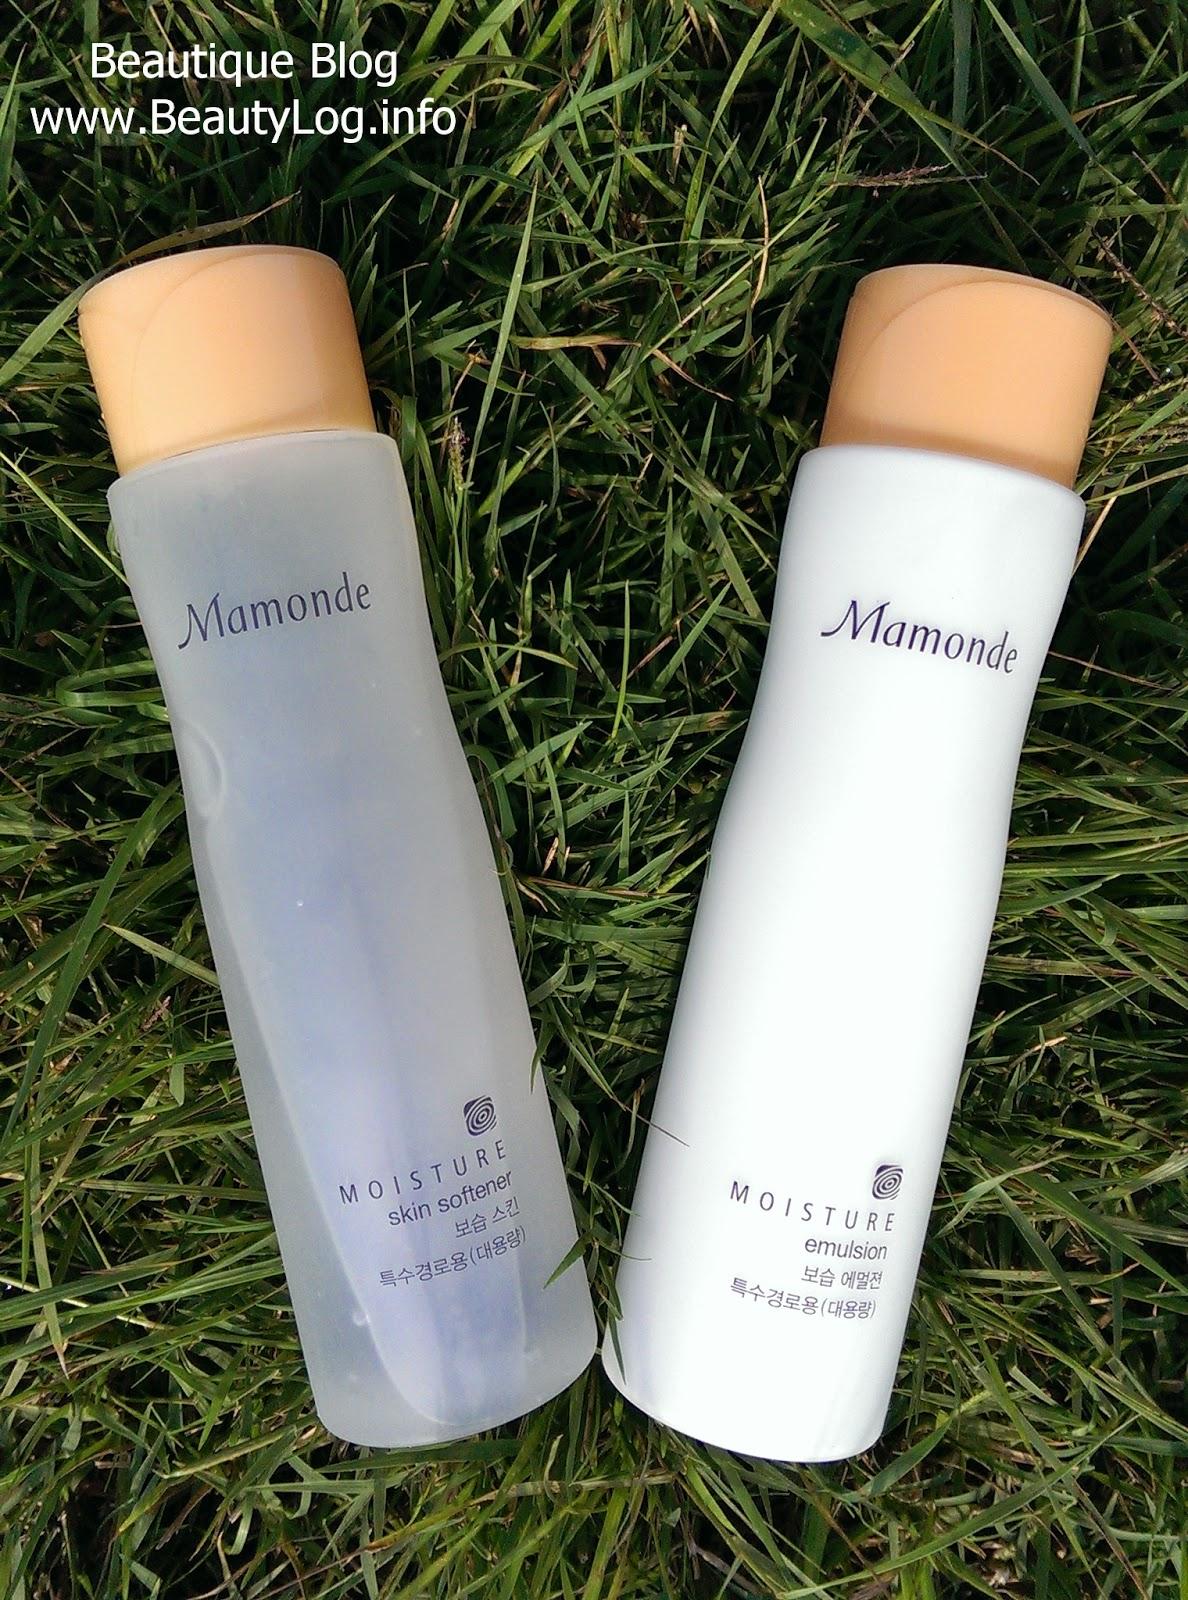 Mamonde Moisture Skin Softener (тонер) и Mamonde Moisture Emulsion (эмульсия)